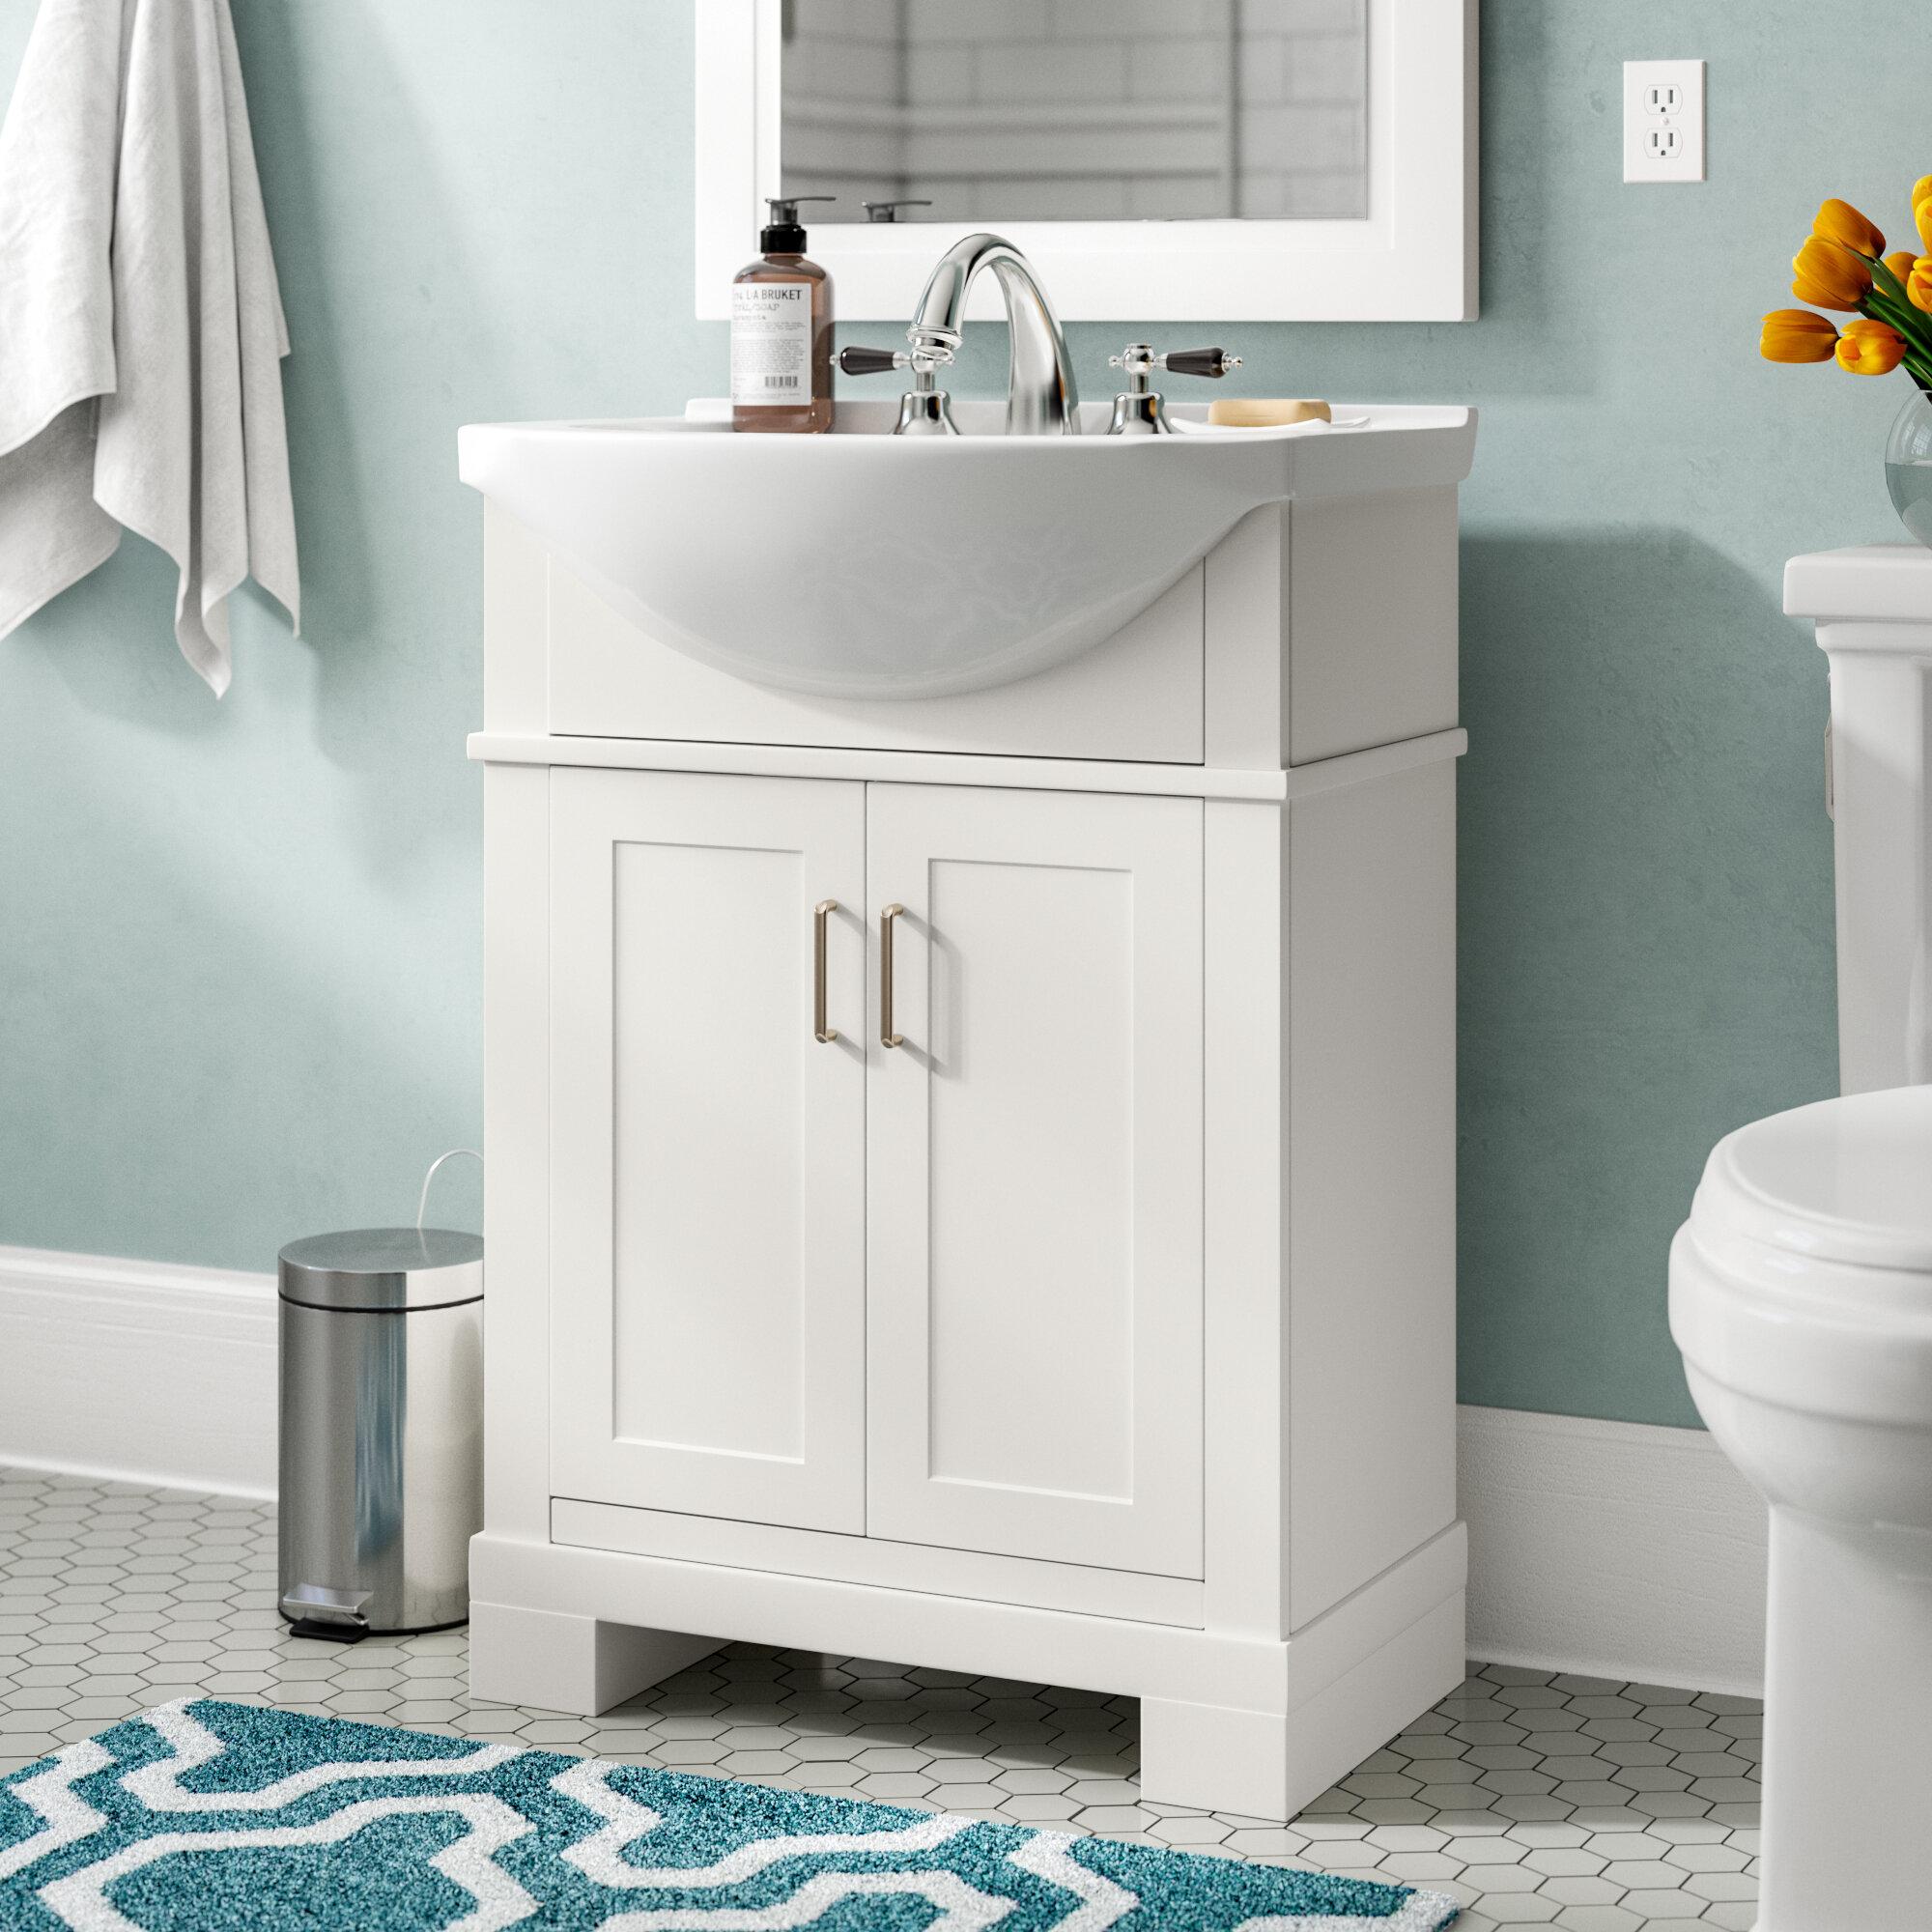 Narrow Depth Bathroom Vanity You Ll, Narrow Width Bathroom Vanity